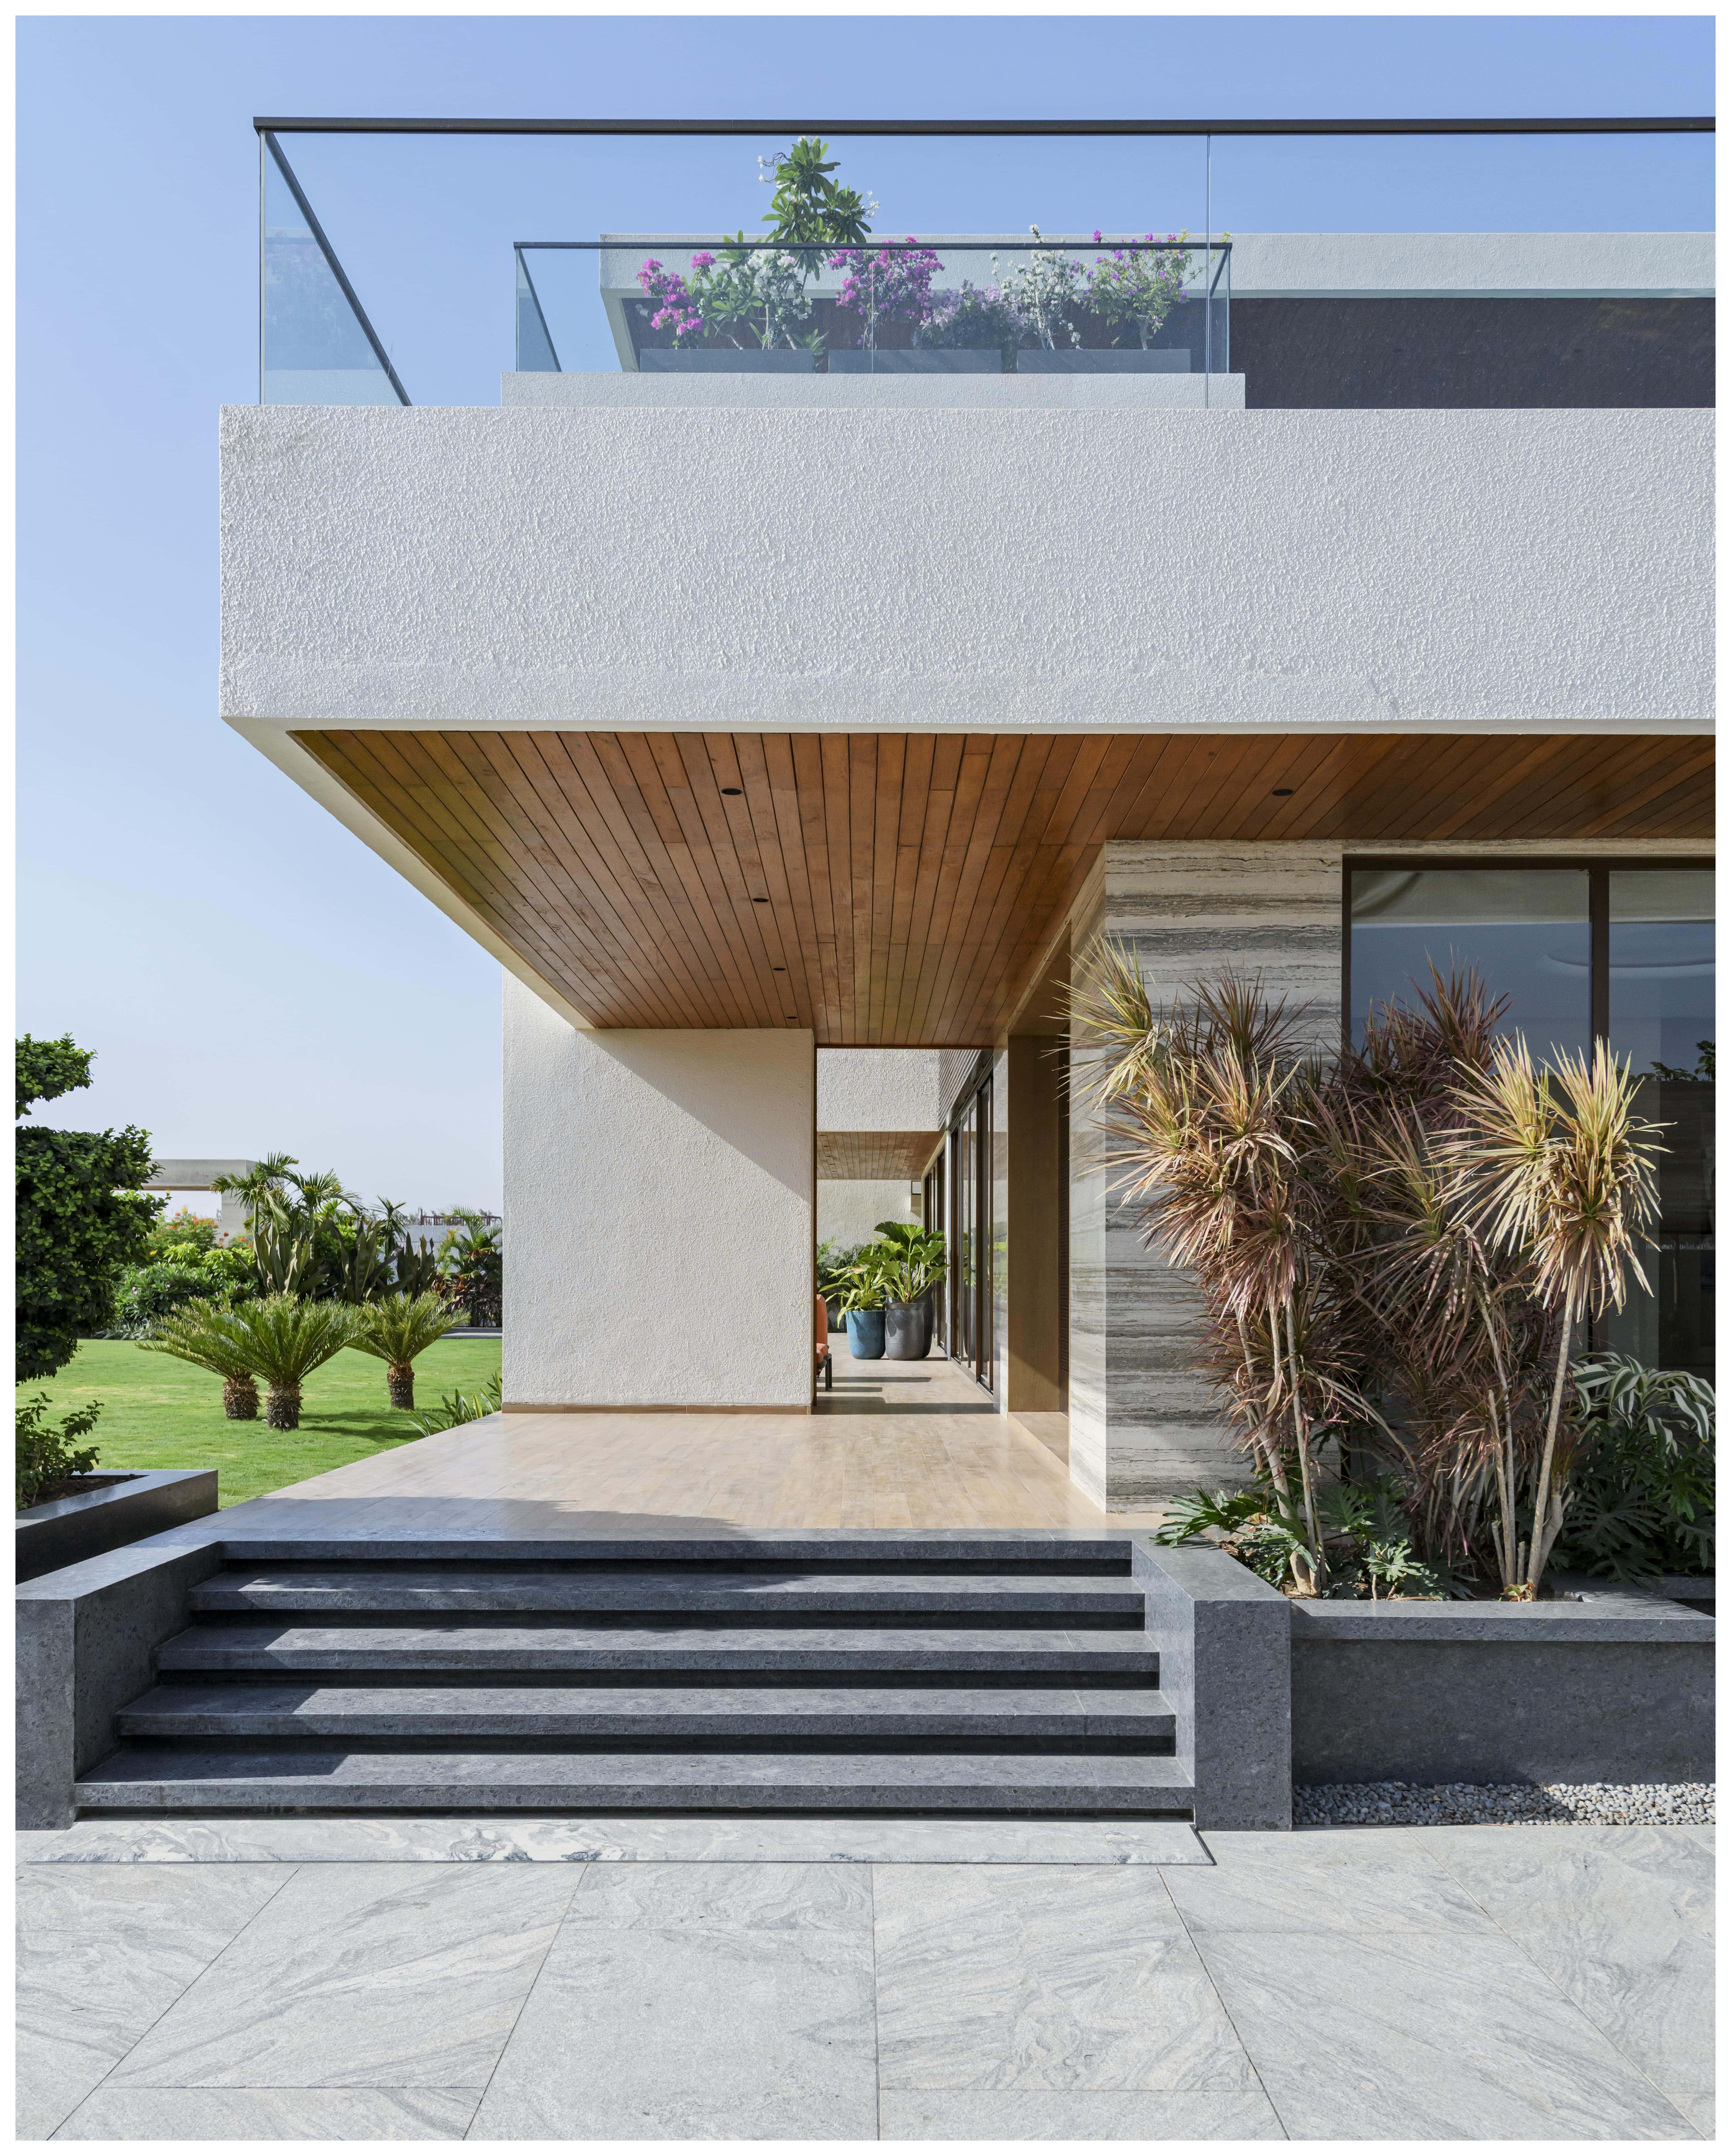 Khushalani Associates - Architecture & Beyond